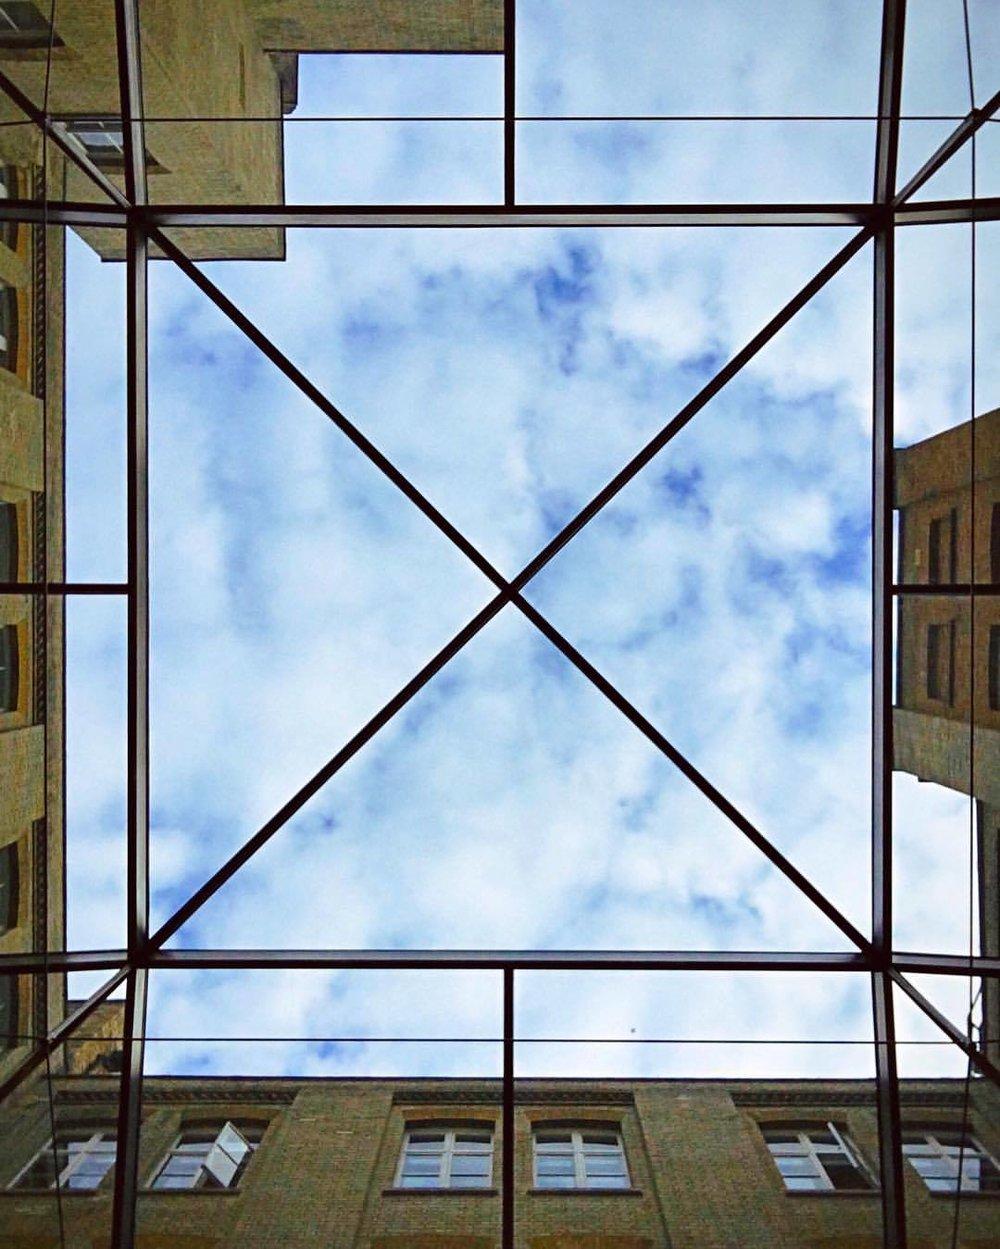 glass ceiling  •  •  •  •  •  #seemycity #stayandwander #myfeatureshoot #mocorocreative #createexplore #cntraveler #thecreatorclass #vscogrid #myfeatureshoot #thisisvsco #mkexplore #mytinyatlas #artofvisuals #aov #global_hotshotz #folkgood #beautifuldestinations #passionpassport #exploretocreate #visualsoflife #visualsofearth #thecoolmagazine #illgrammers #london #coventgarden #highcelings #shotoniphone (at Apple Store - Covent Garden)